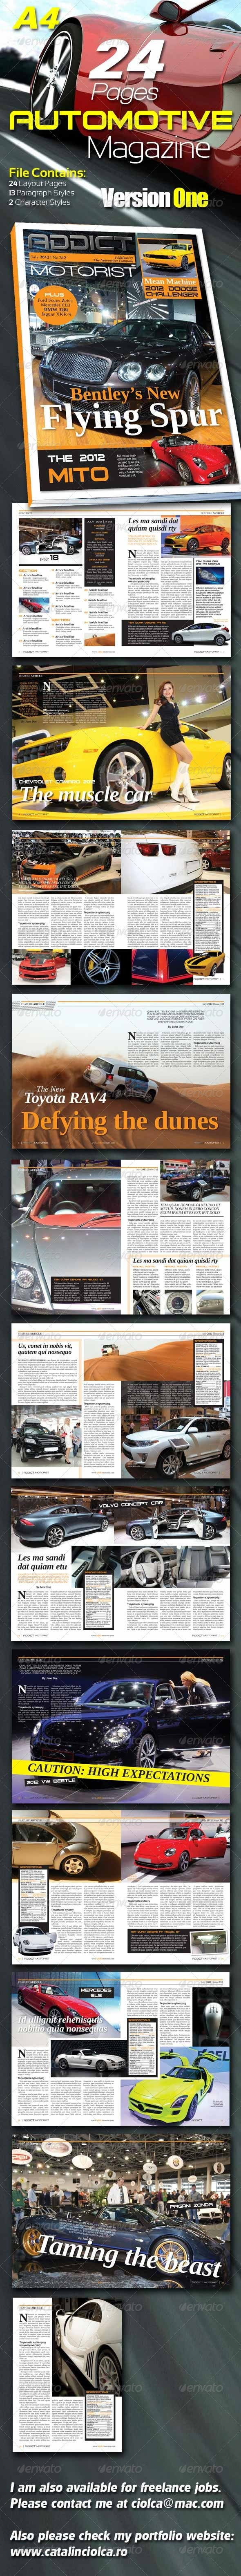 GraphicRiver 24 Pages Automotive Magazine Version One 1517089